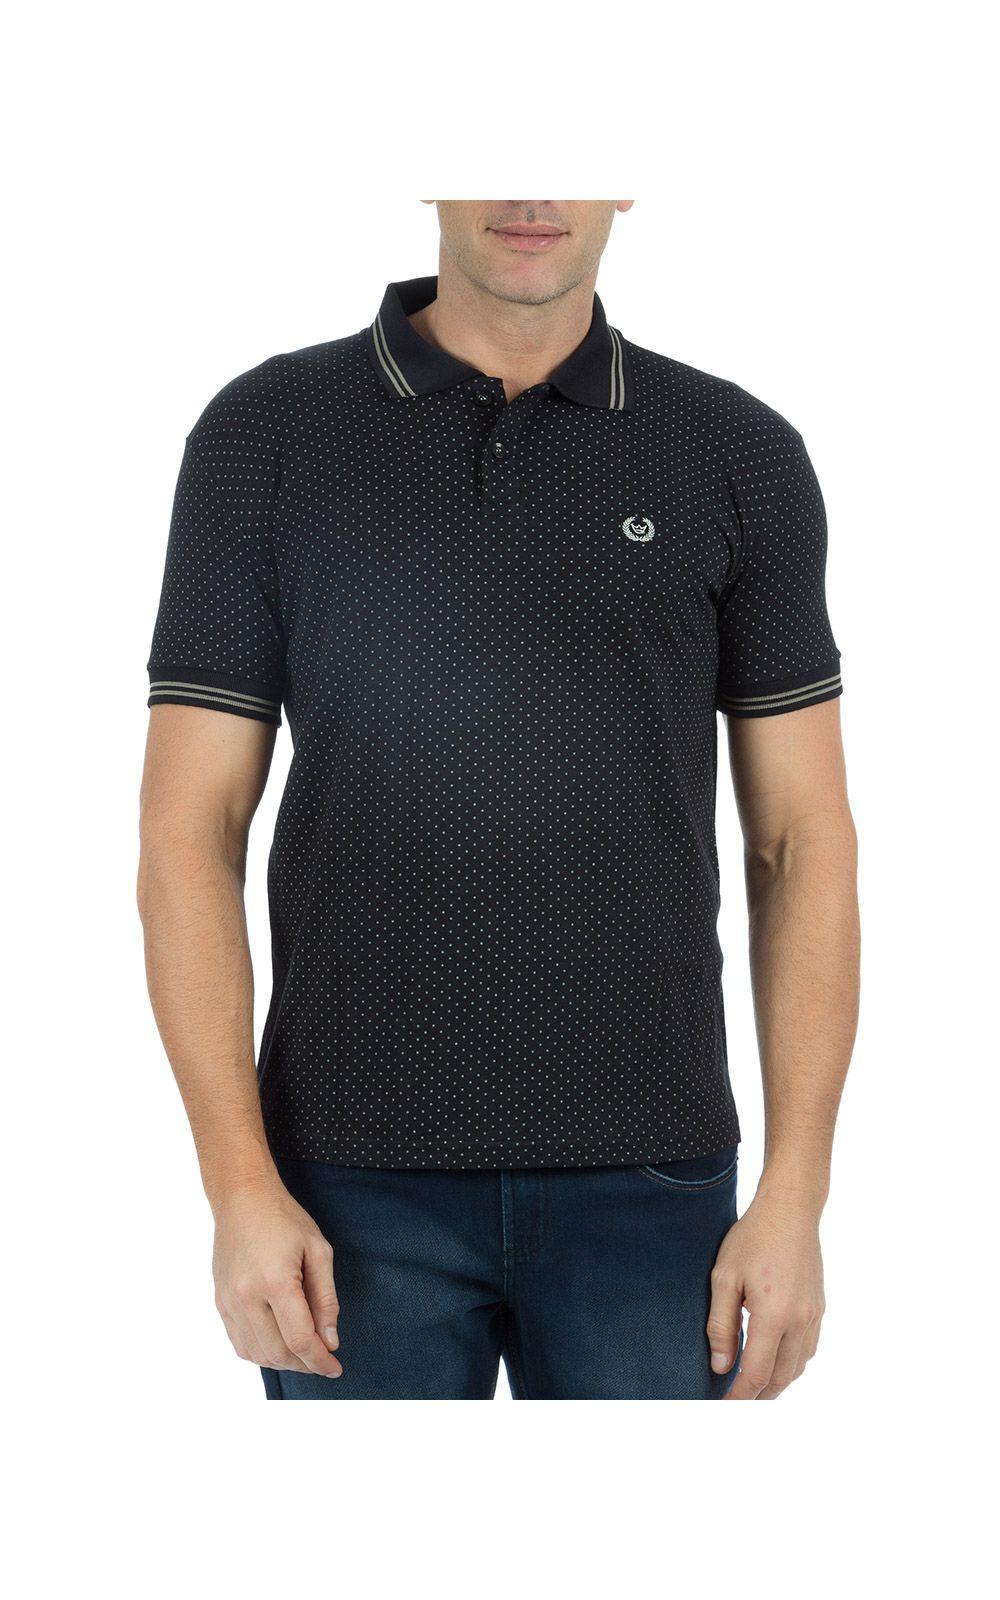 Foto 1 - Camisa Polo Masculina Preta Estampada